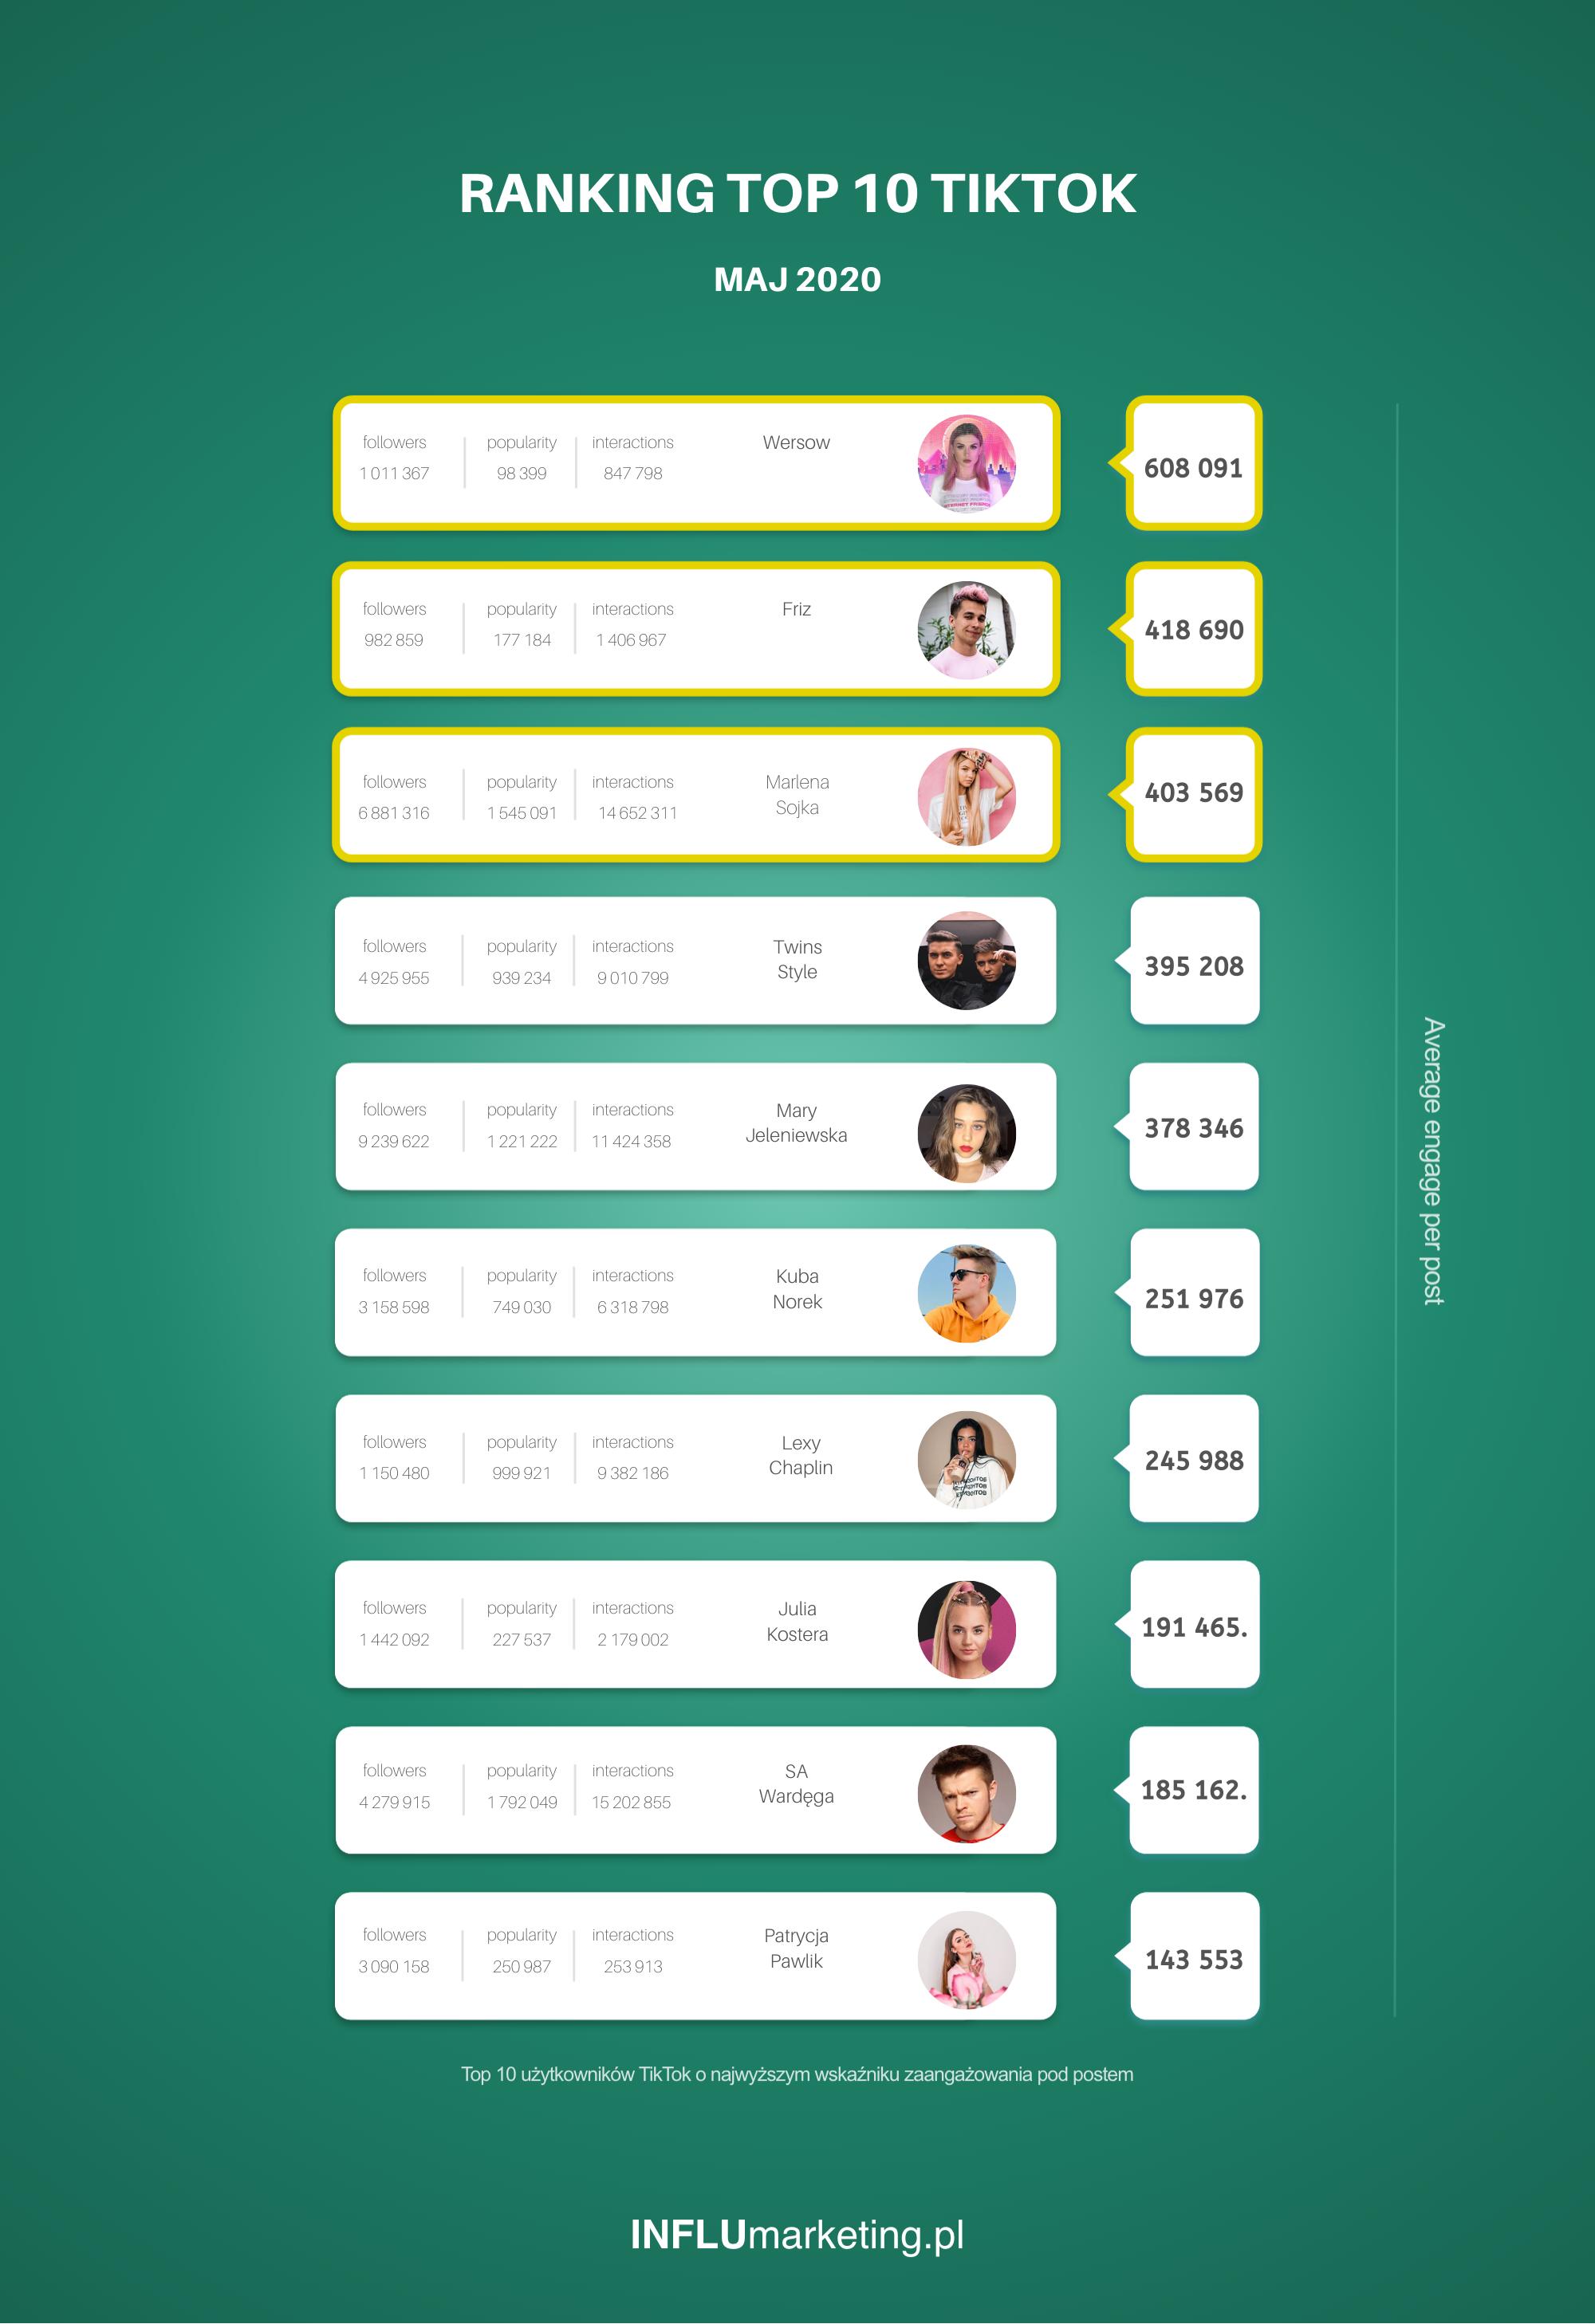 Ranking Tik Tok Polska TOP 2020 maj png